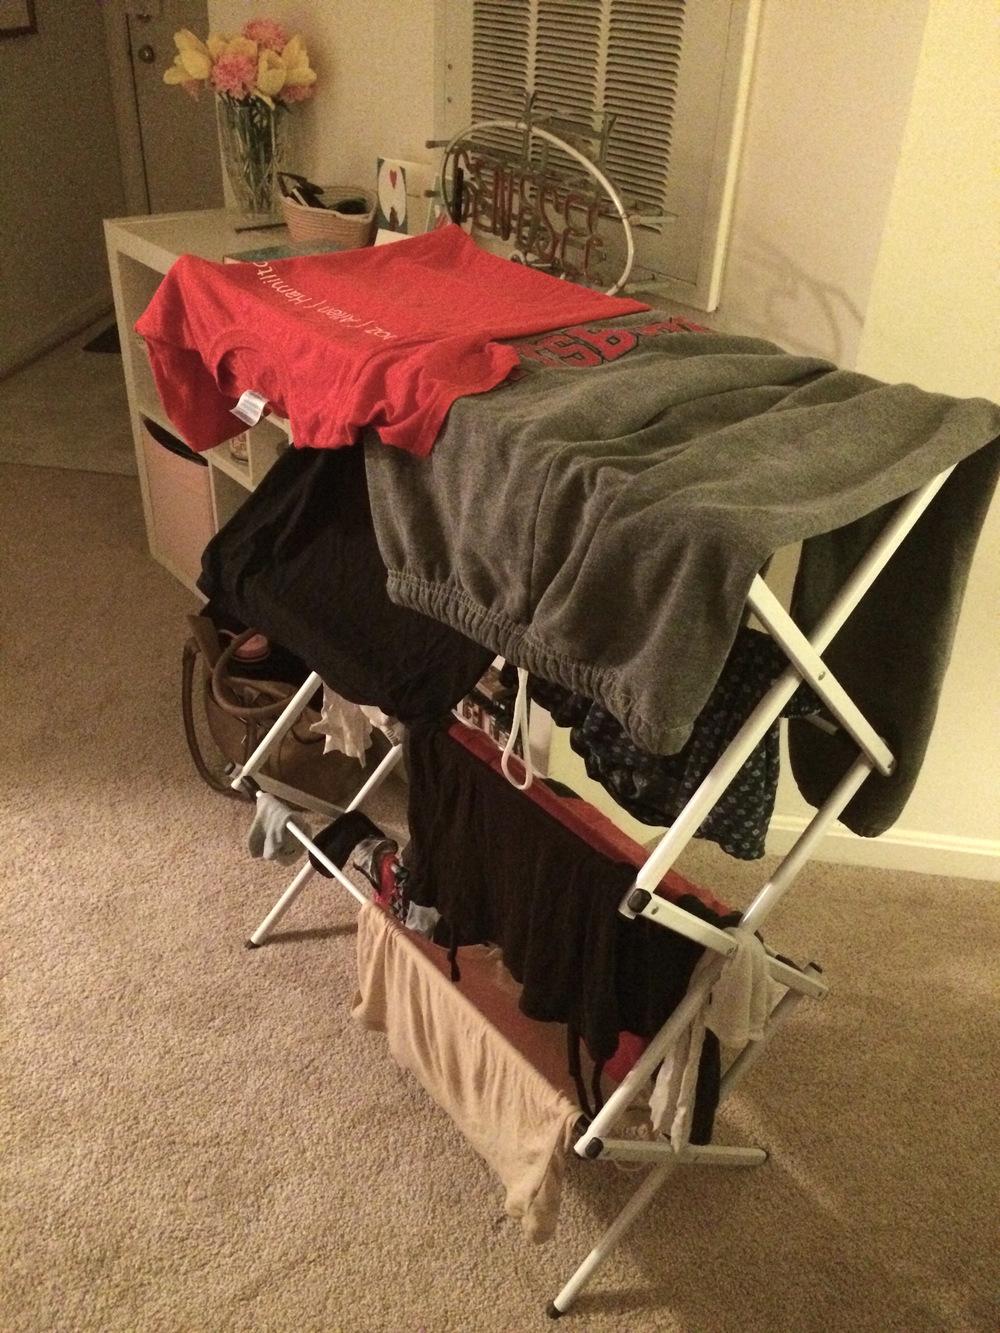 saving-money-clothes-drying-rack.jpg